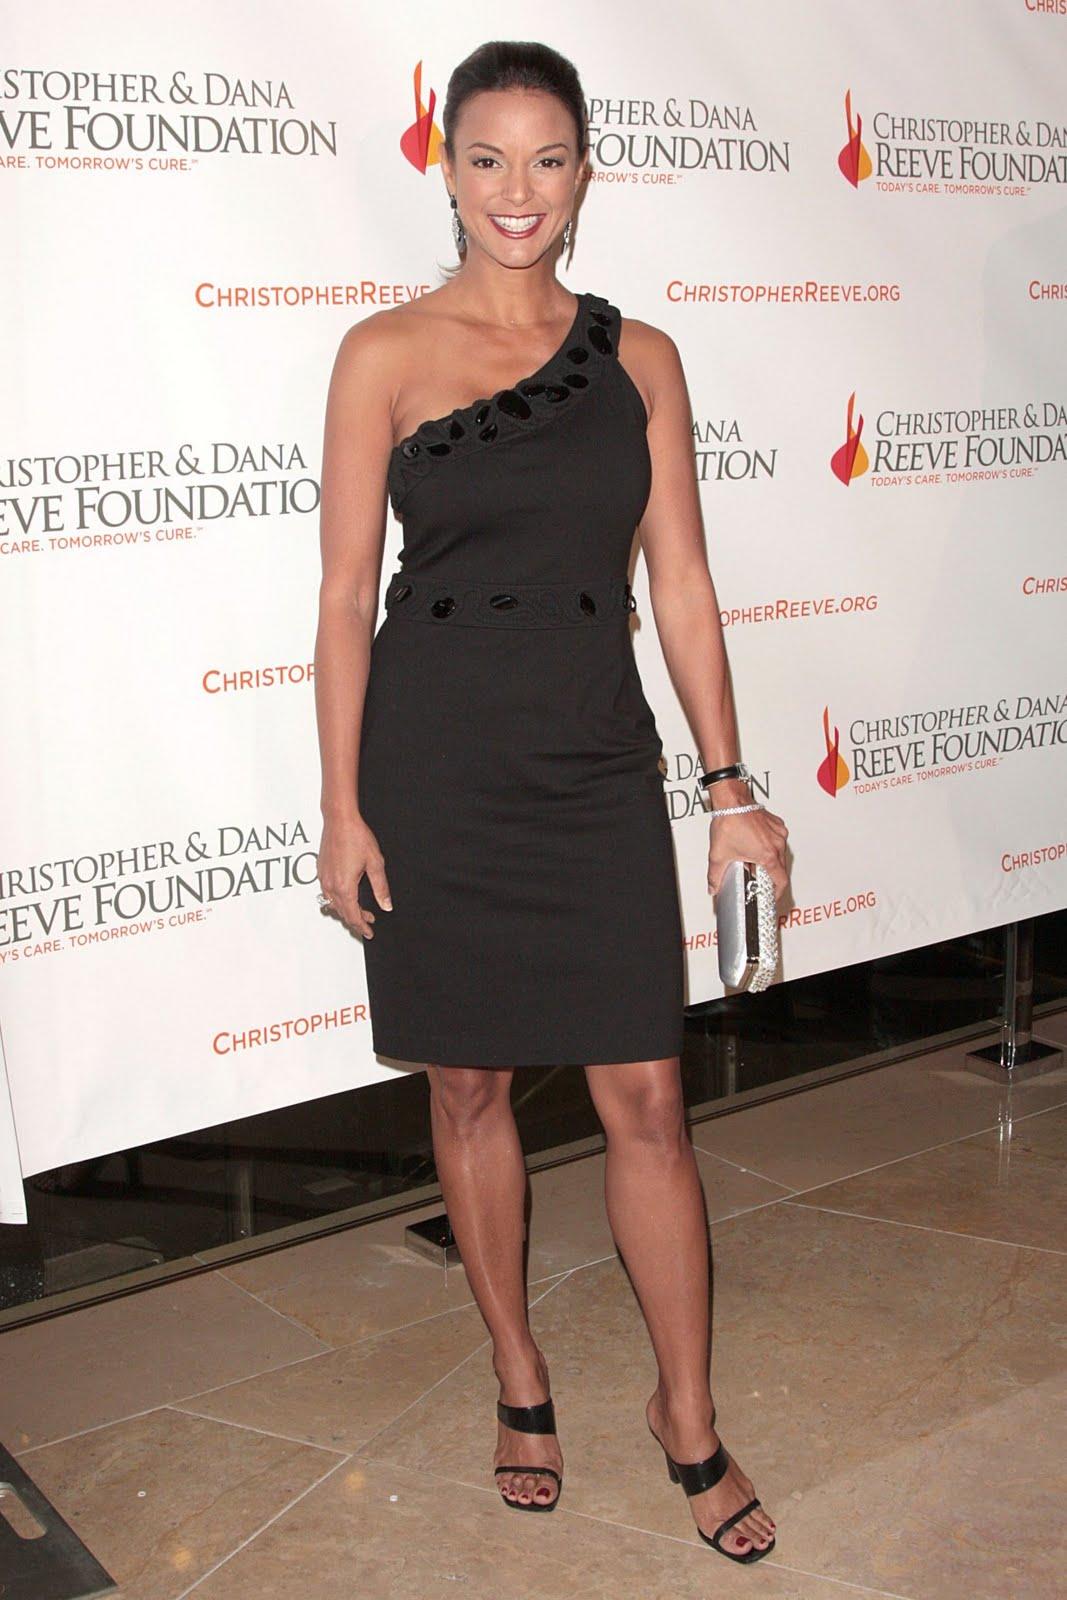 HAlLe Beauty Blog: Eva LaRue Feet  HAlLe Beauty Bl...